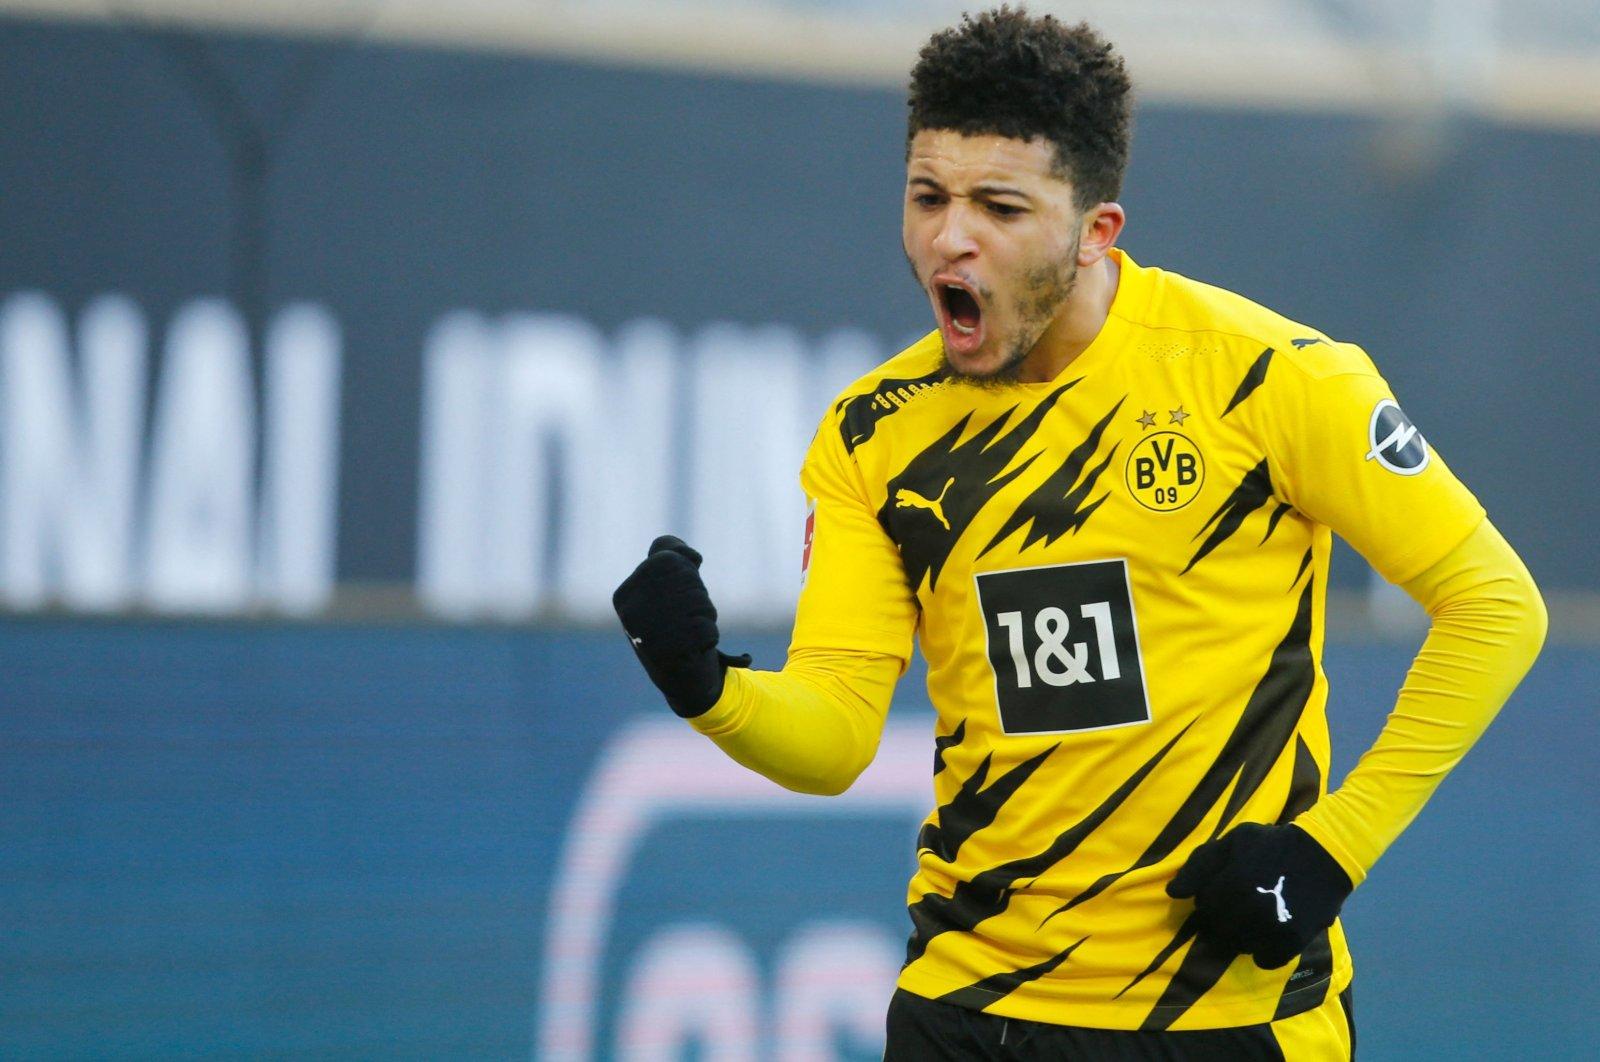 Dortmund's English midfielder Jadon Sancho celebrates after scoring during a Bundesliga match against TSG 1899 Hoffenheim in Dortmund, western Germany, Feb. 13, 2021. (AFP Photo)